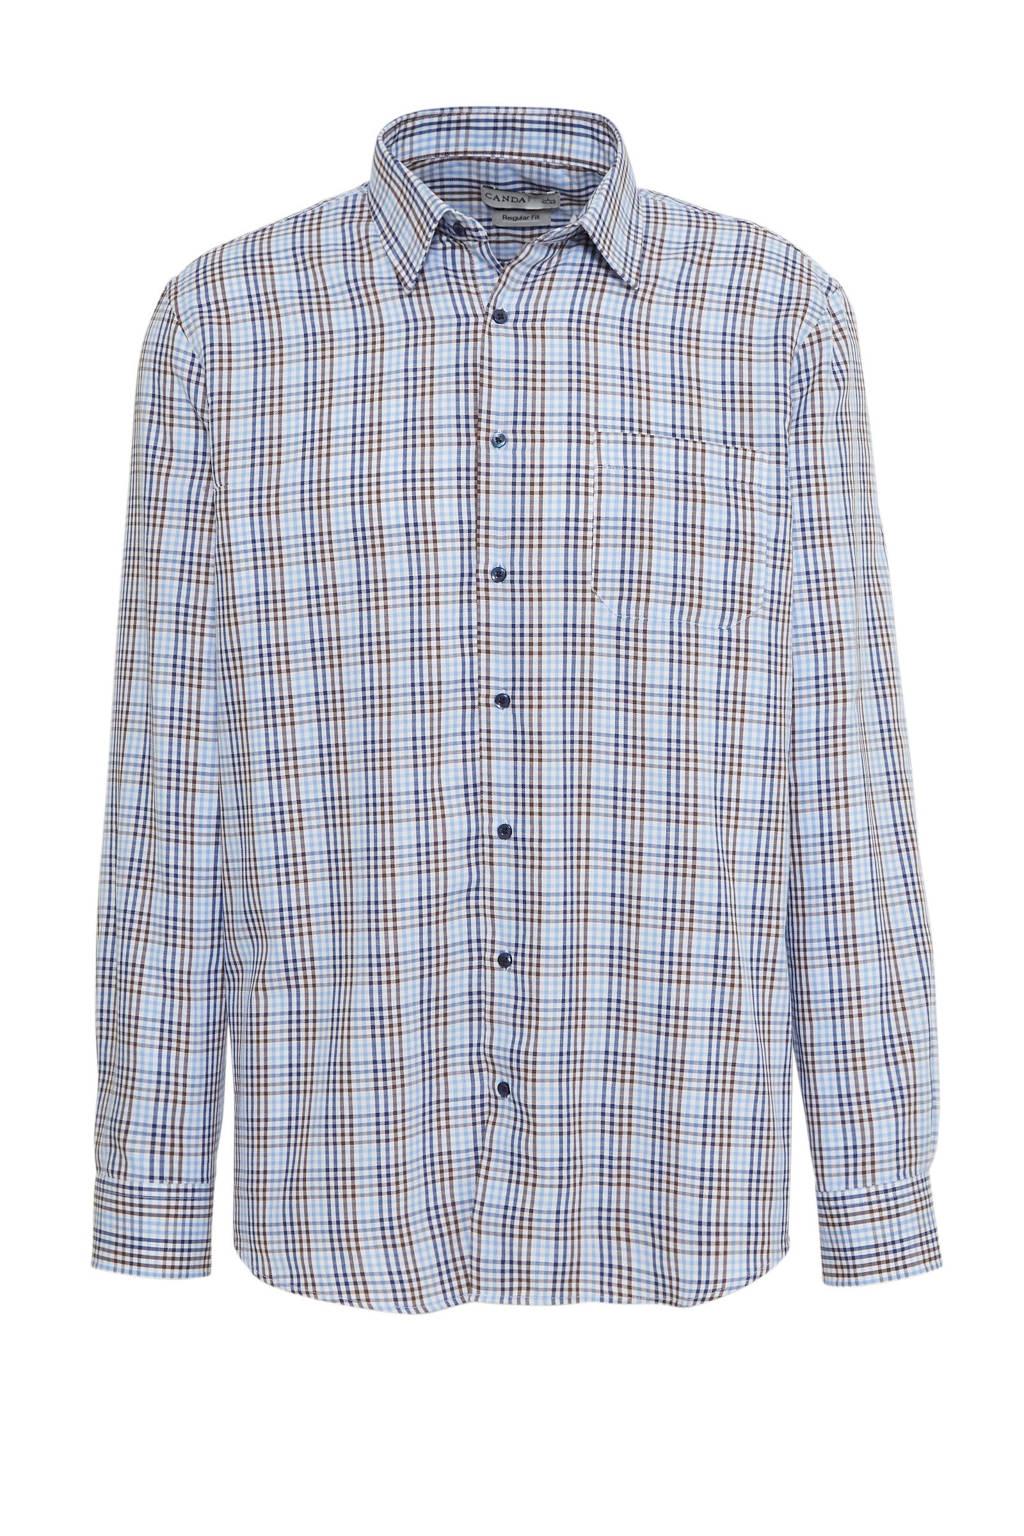 C&A Canda geruit regular fit overhemd donkerblauw, Donkerblauw